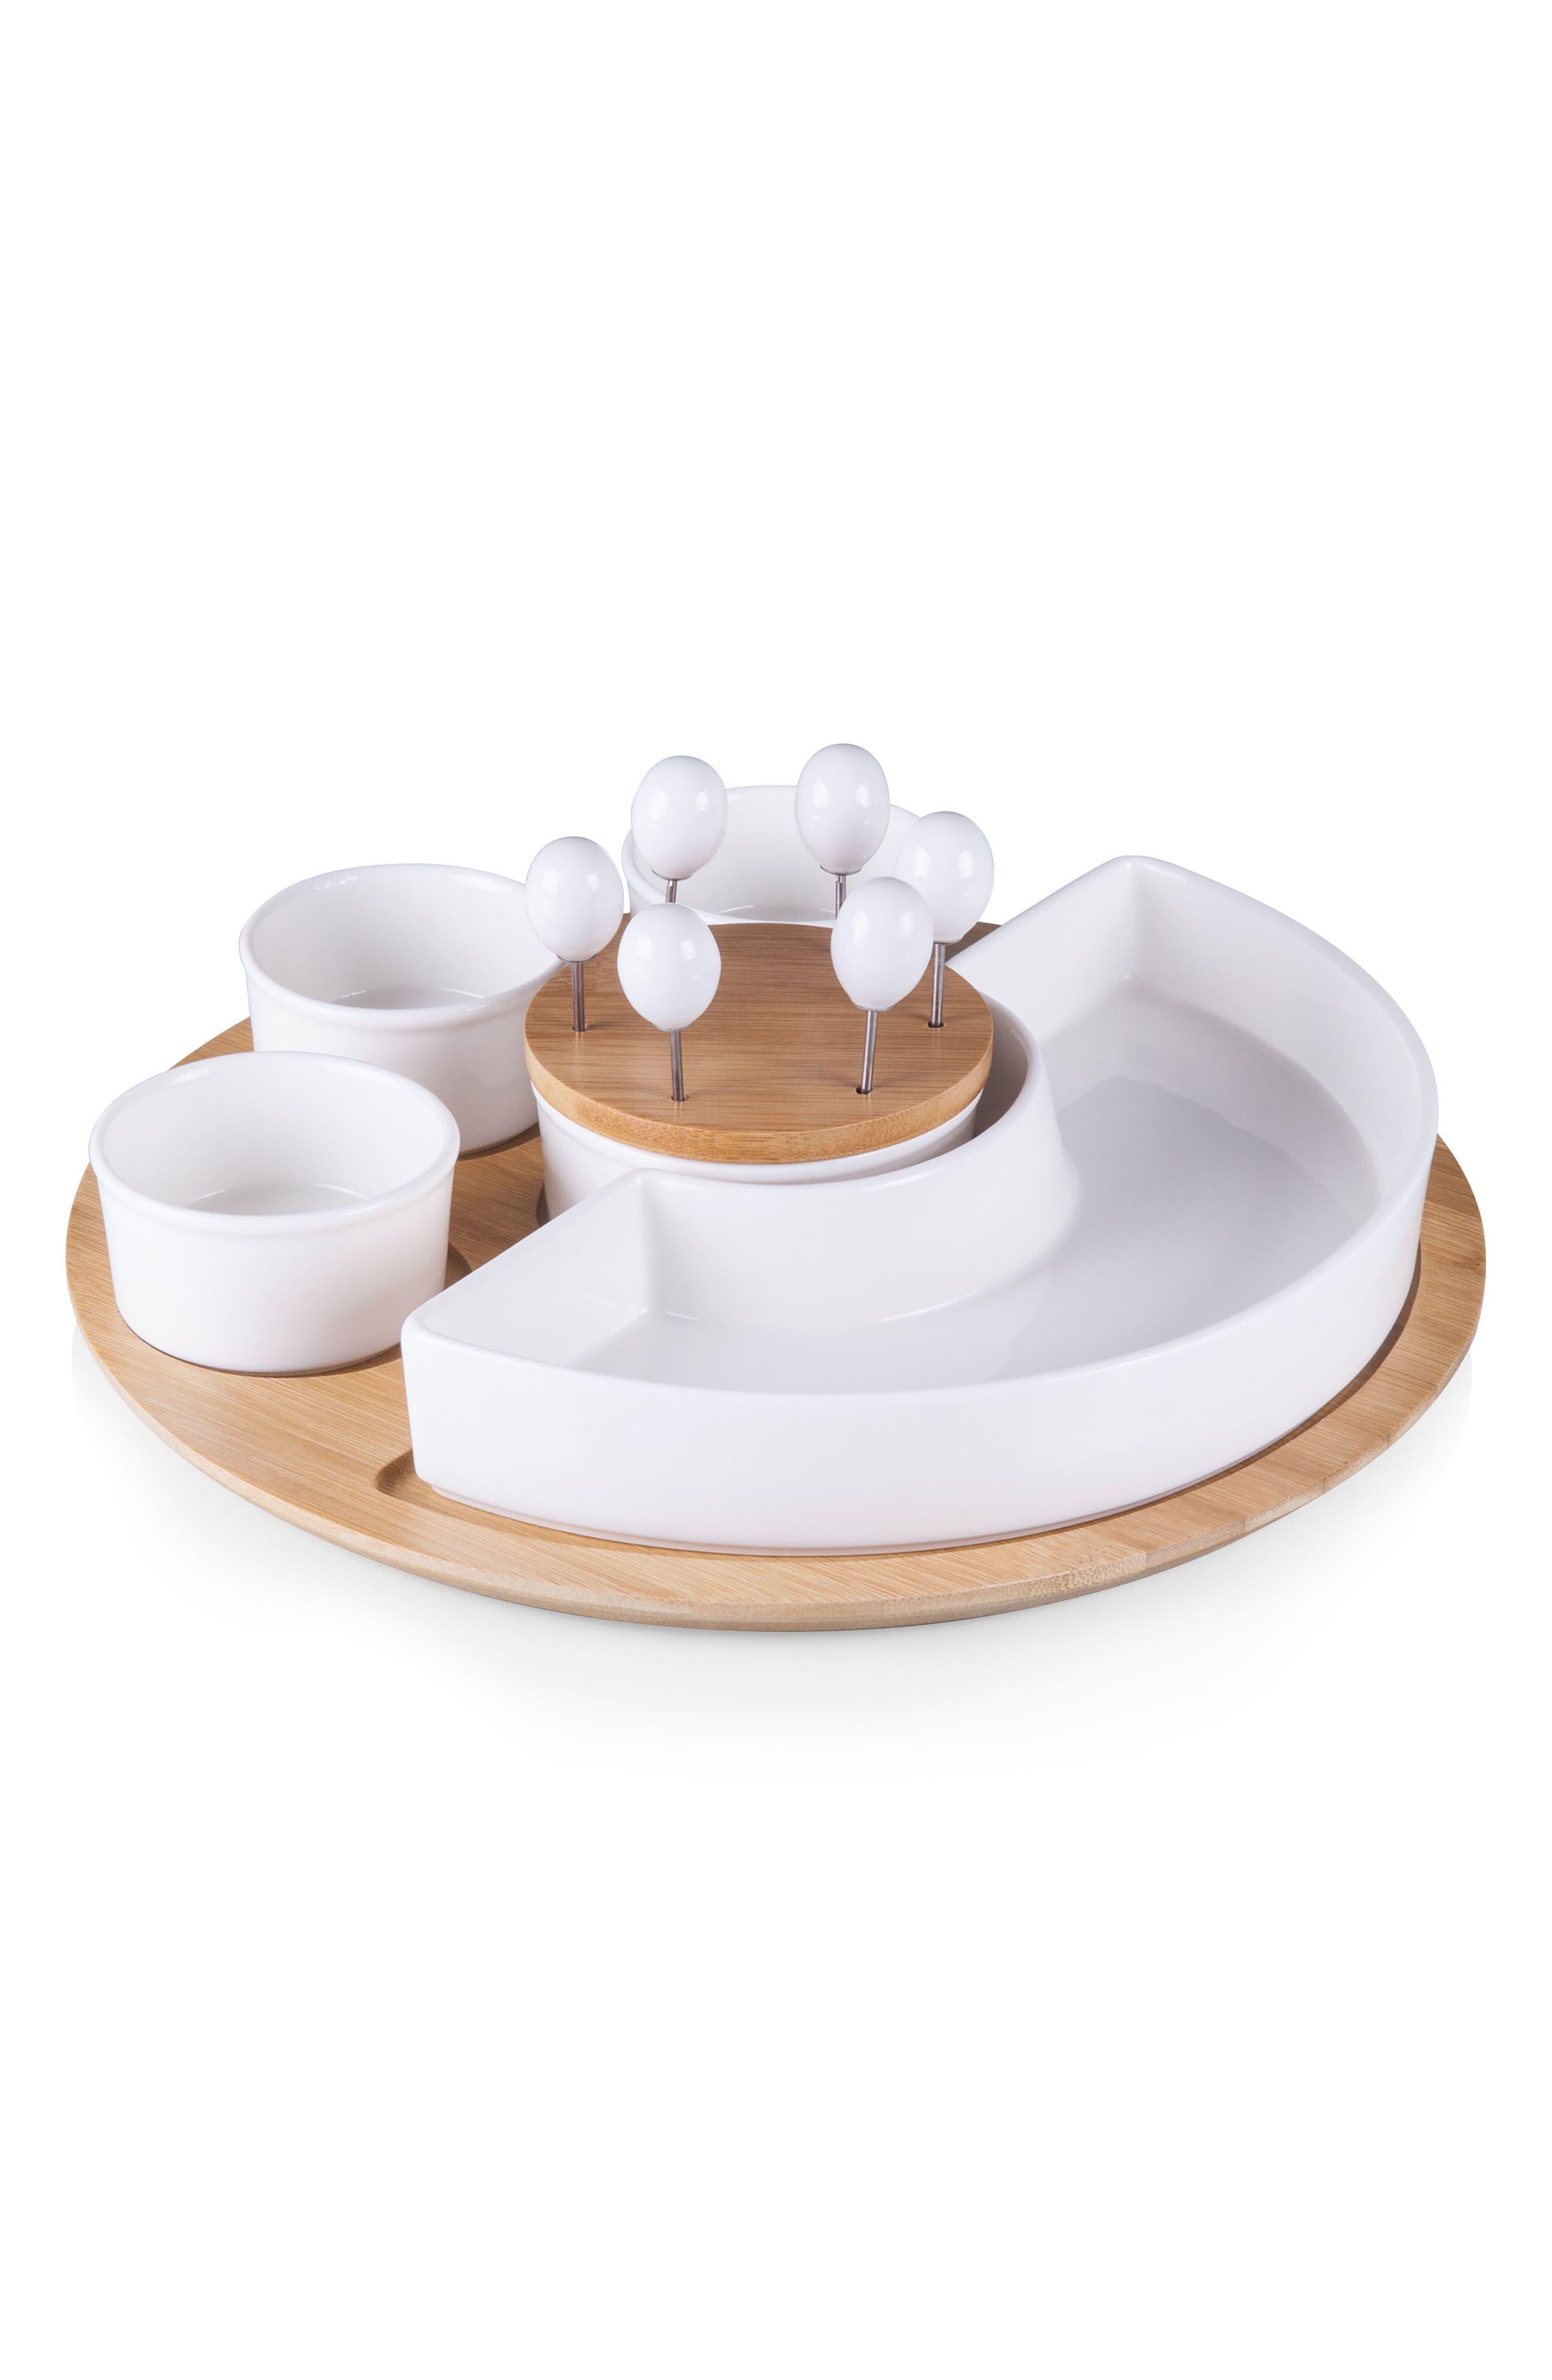 Symphony Appetizer Bowl Serving Set,                             Main thumbnail 1, color,                             BROWN/ WHITE